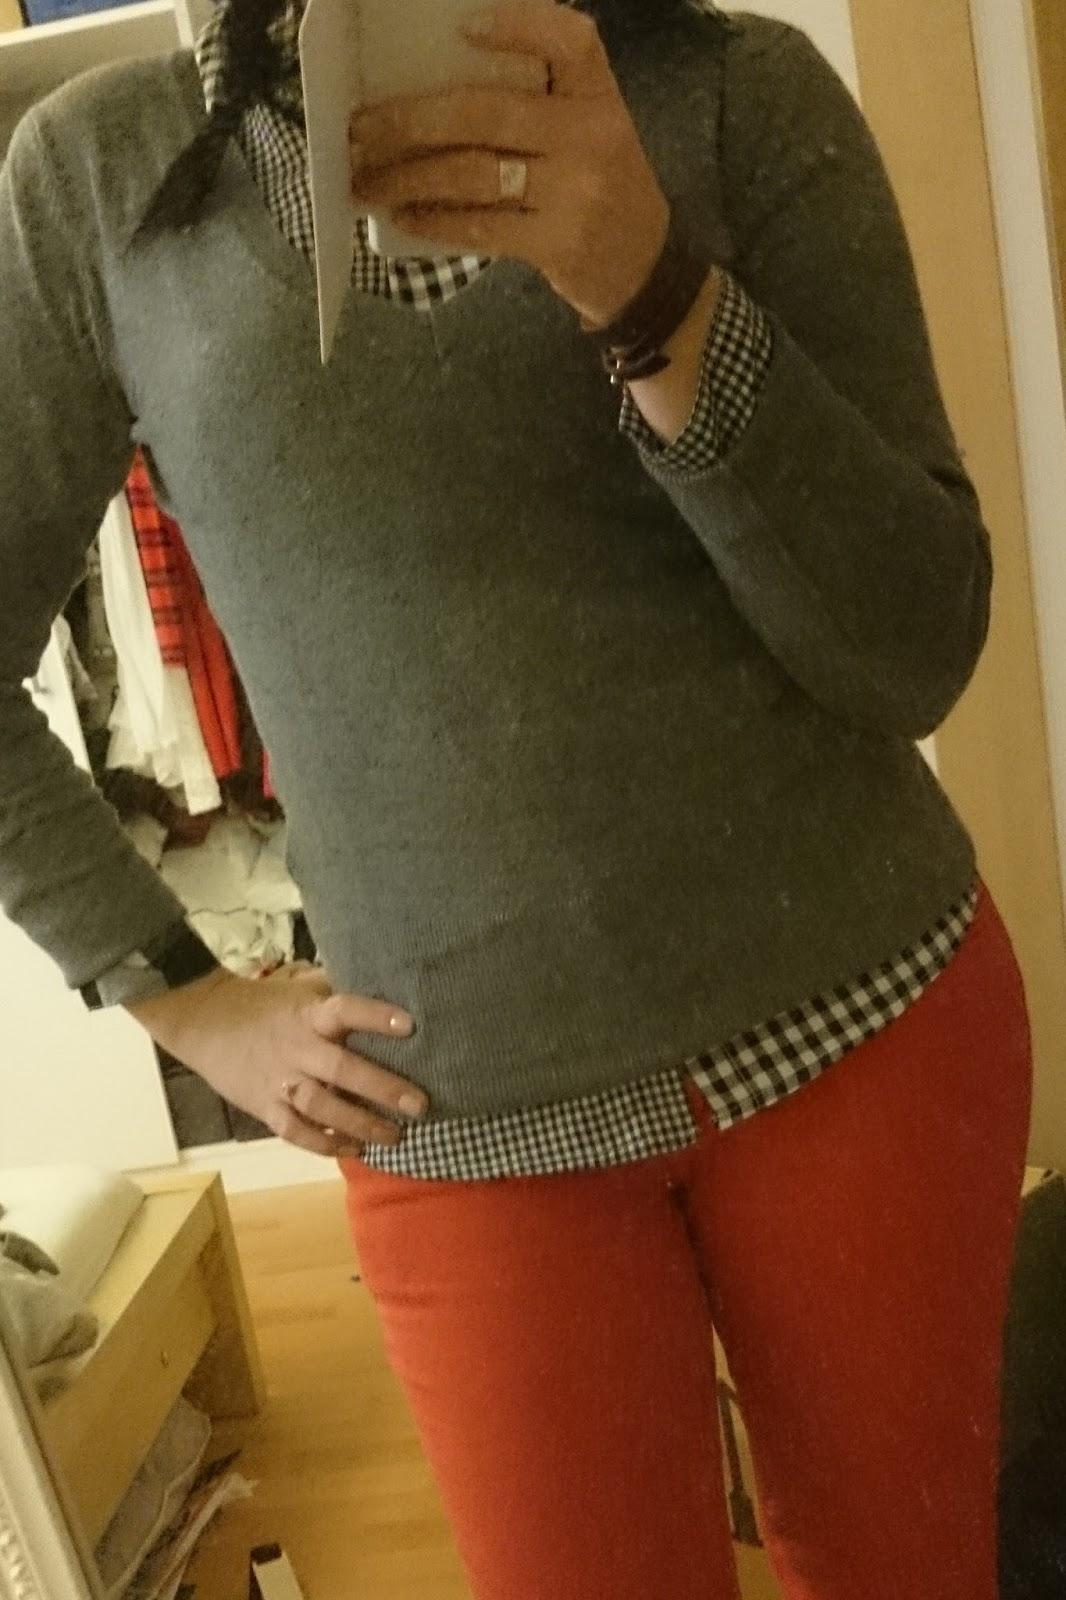 Rote Jeans mit Bluse und Pullover